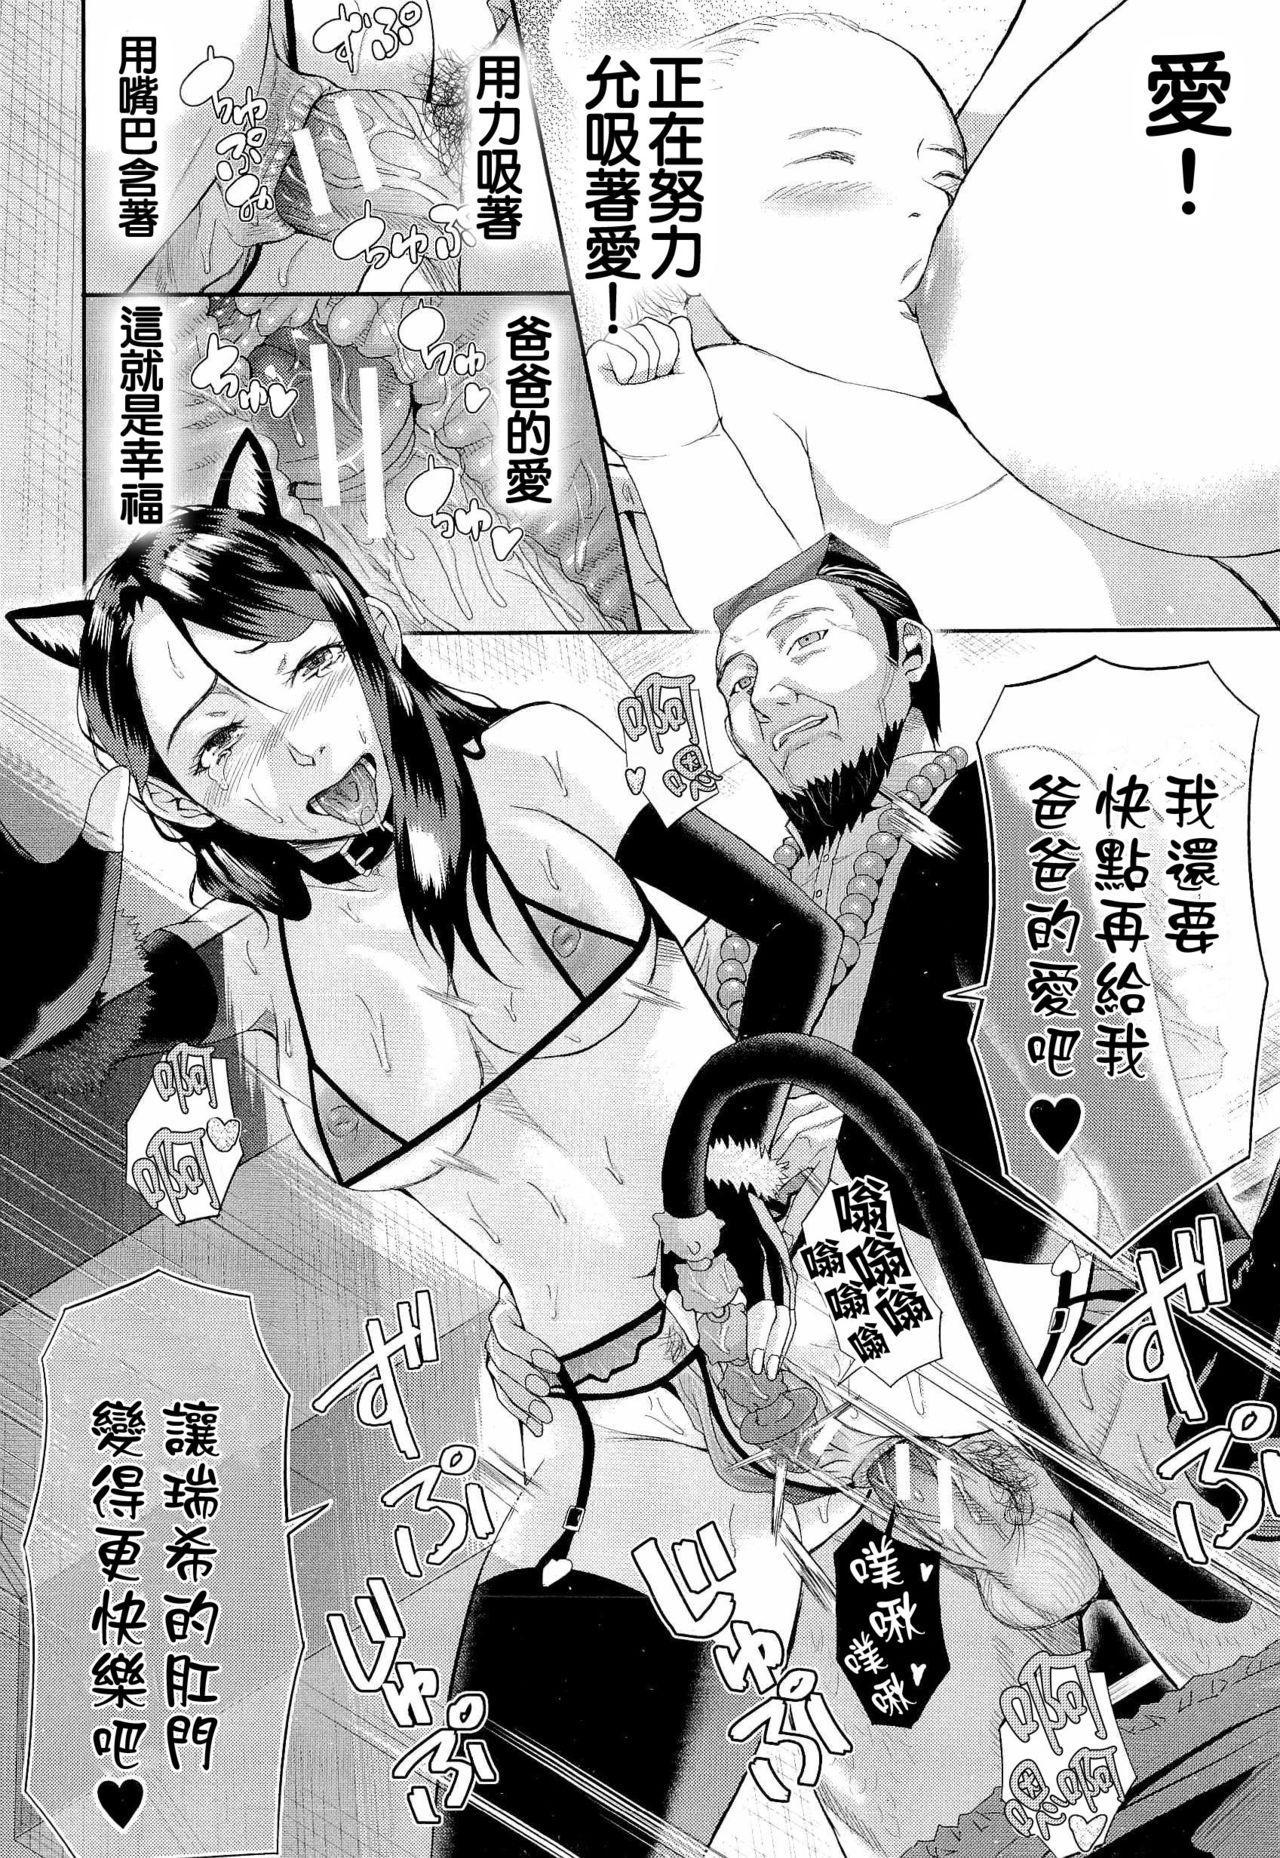 [Honebuto Danshaku] Innou Kaizou Program ~Oyako Zecchou Cult Ochi~ [Chinese]【不想记名重嵌--高质量图源】 98